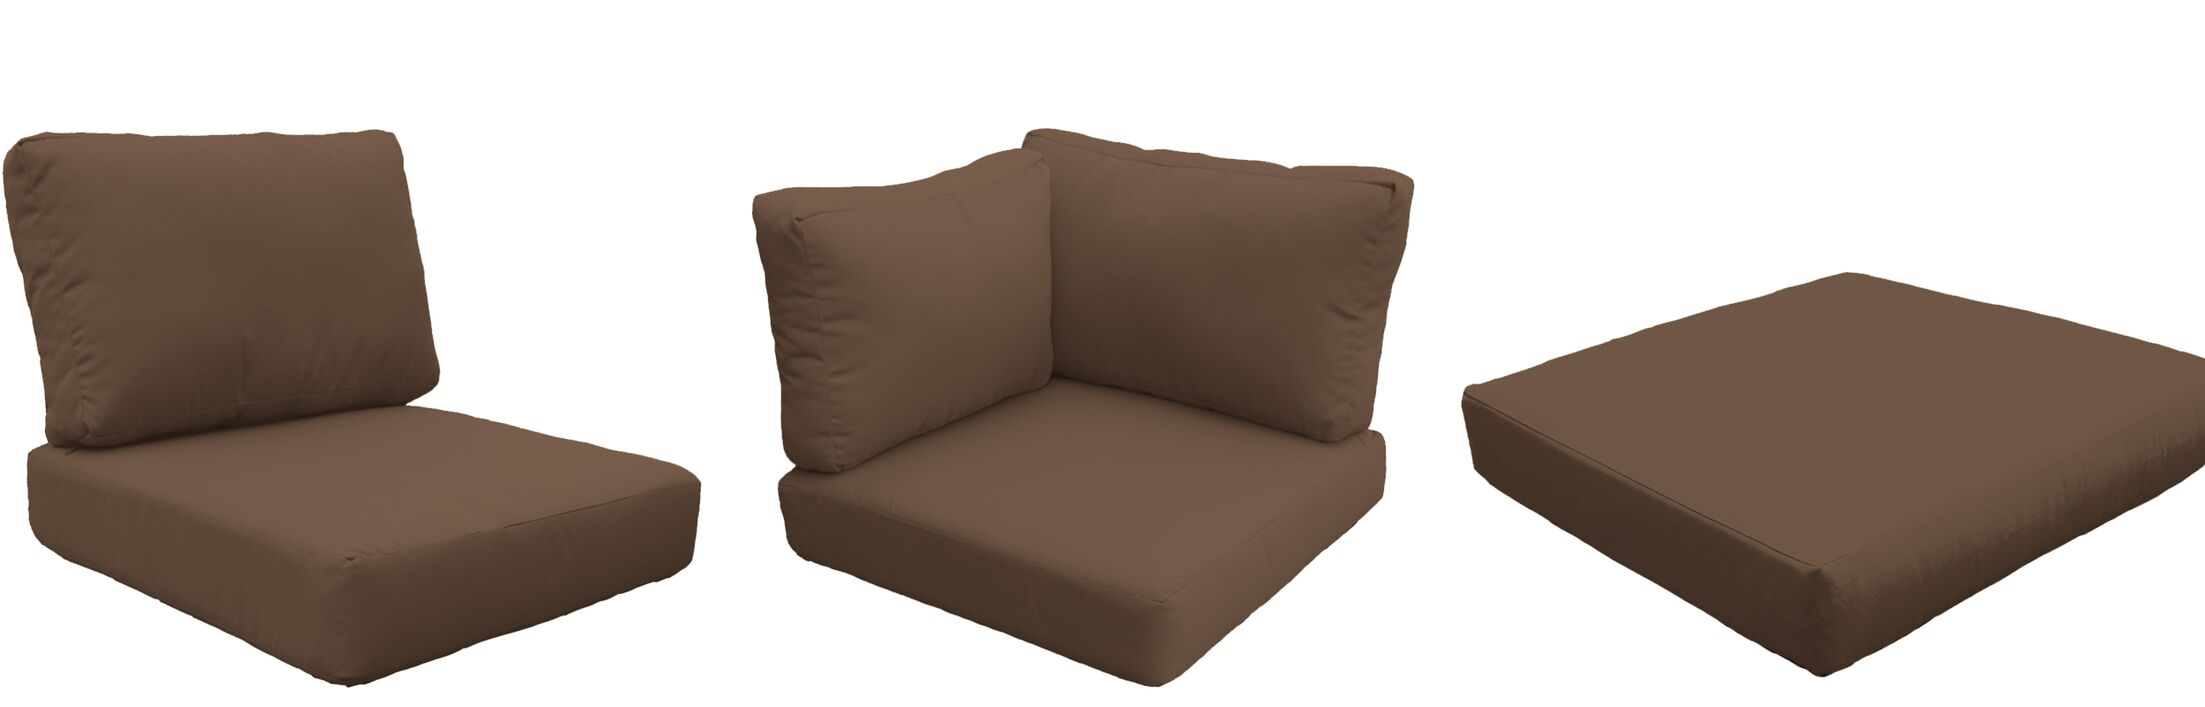 Fairmont Outdoor 20 Piece Lounge Chair Cushion Set Fabric: Cocoa